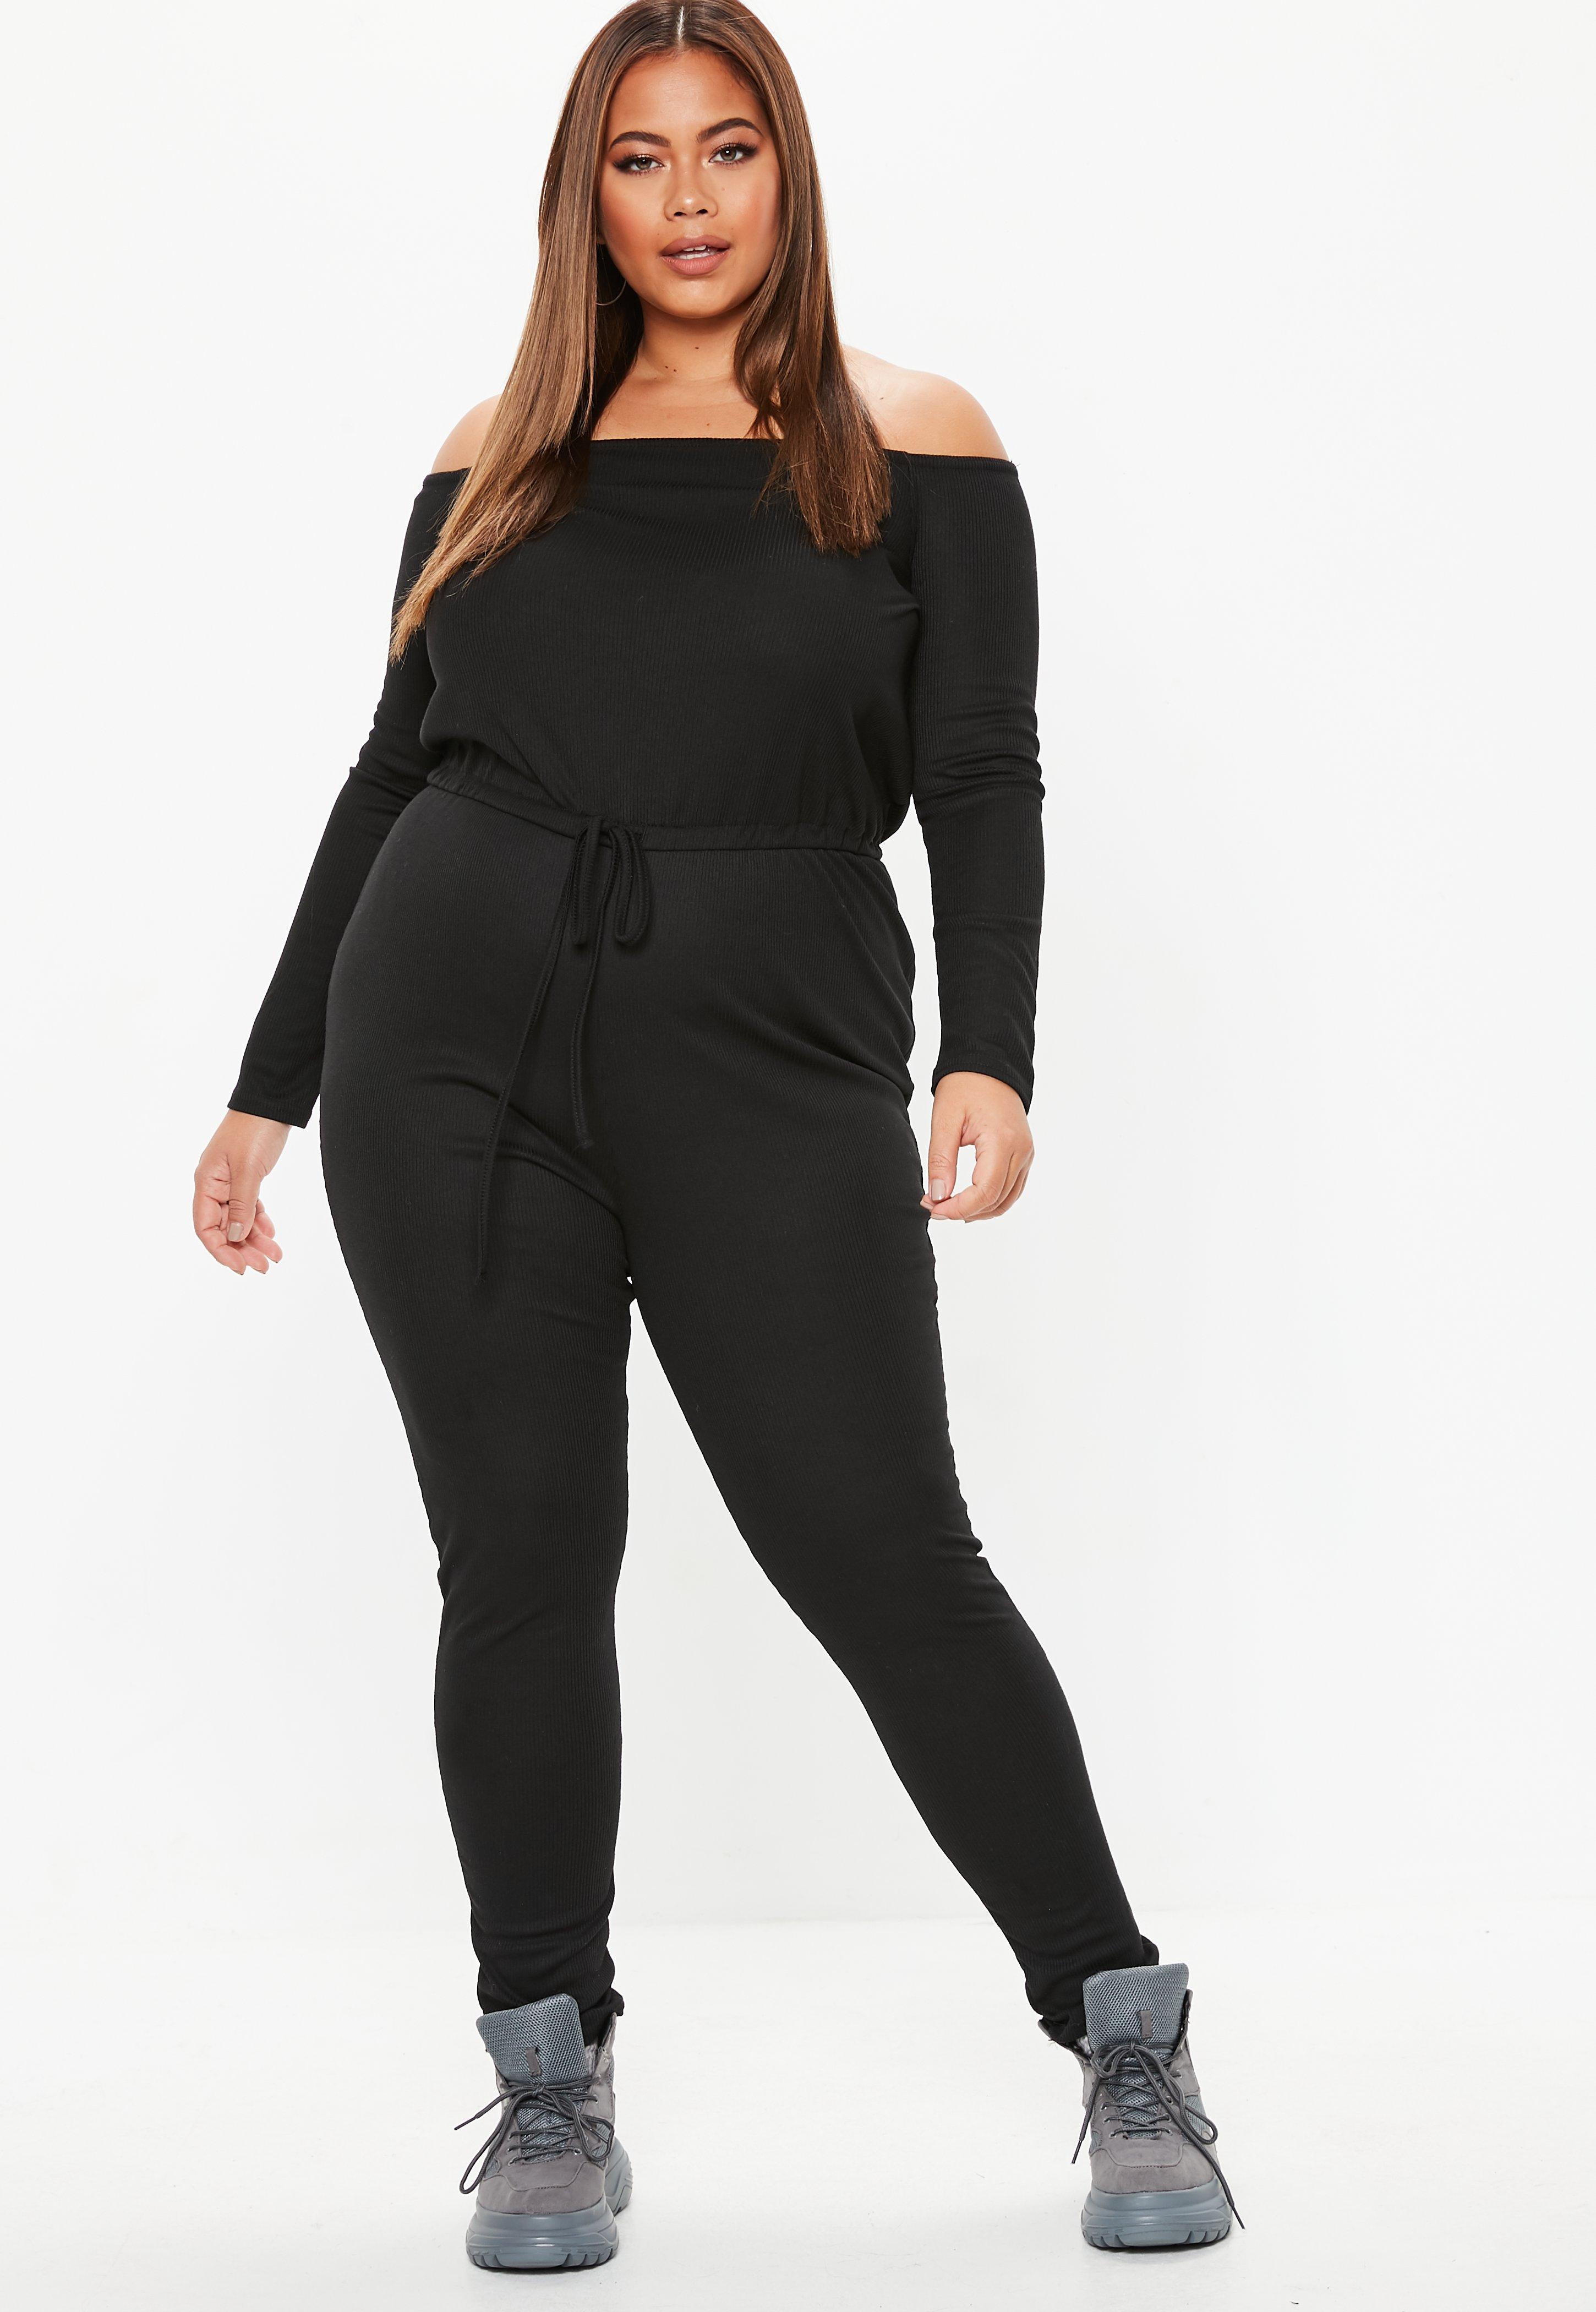 444ad7bd716 Plus Size Jumpsuits   Rompers Online